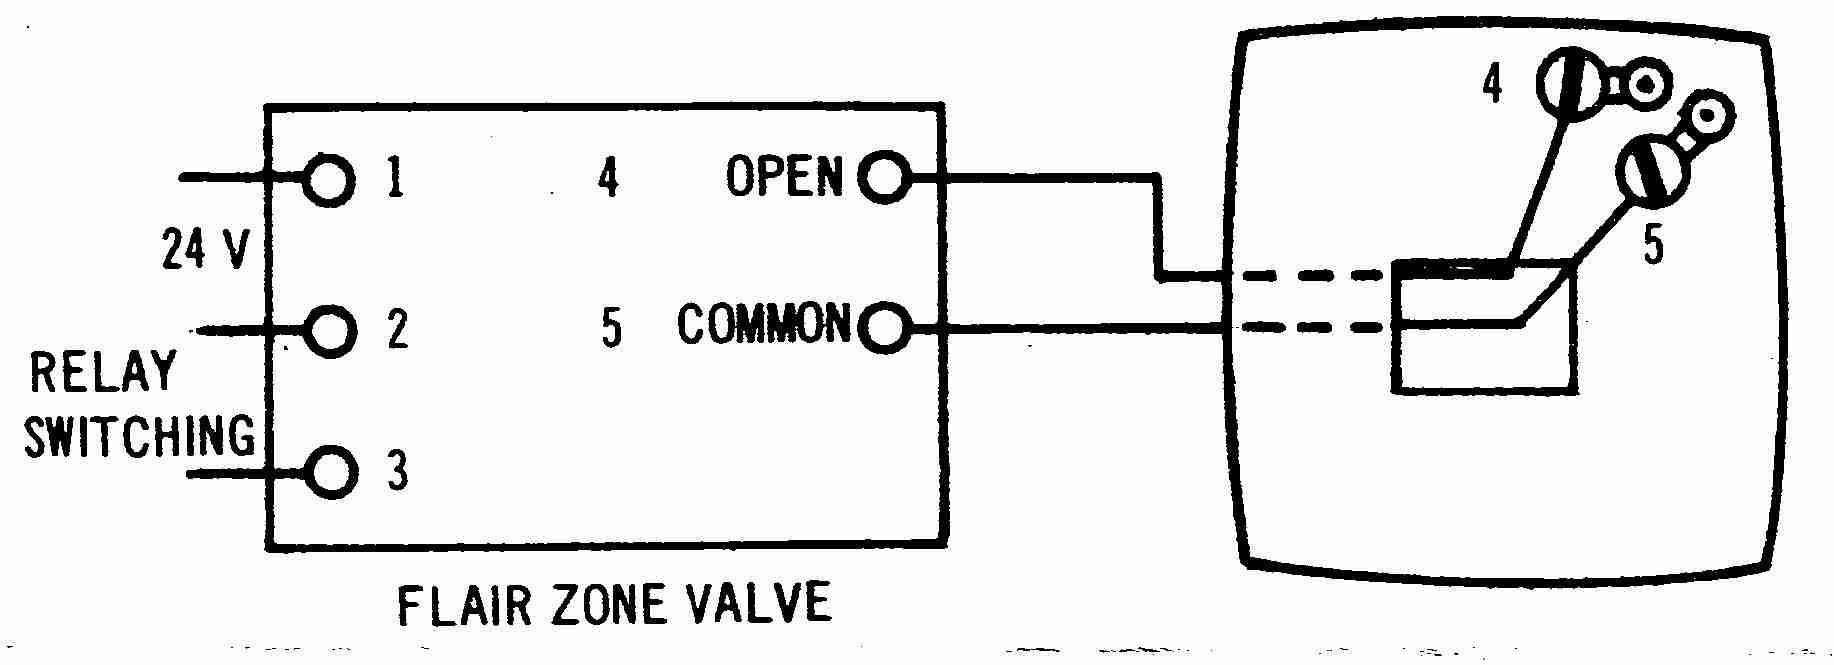 Flair2w_001_DJFc1?resize=665%2C241&ssl=1 white rodgers zone valve wiring diagram wiring diagram 90-t40f3 wiring diagram at eliteediting.co